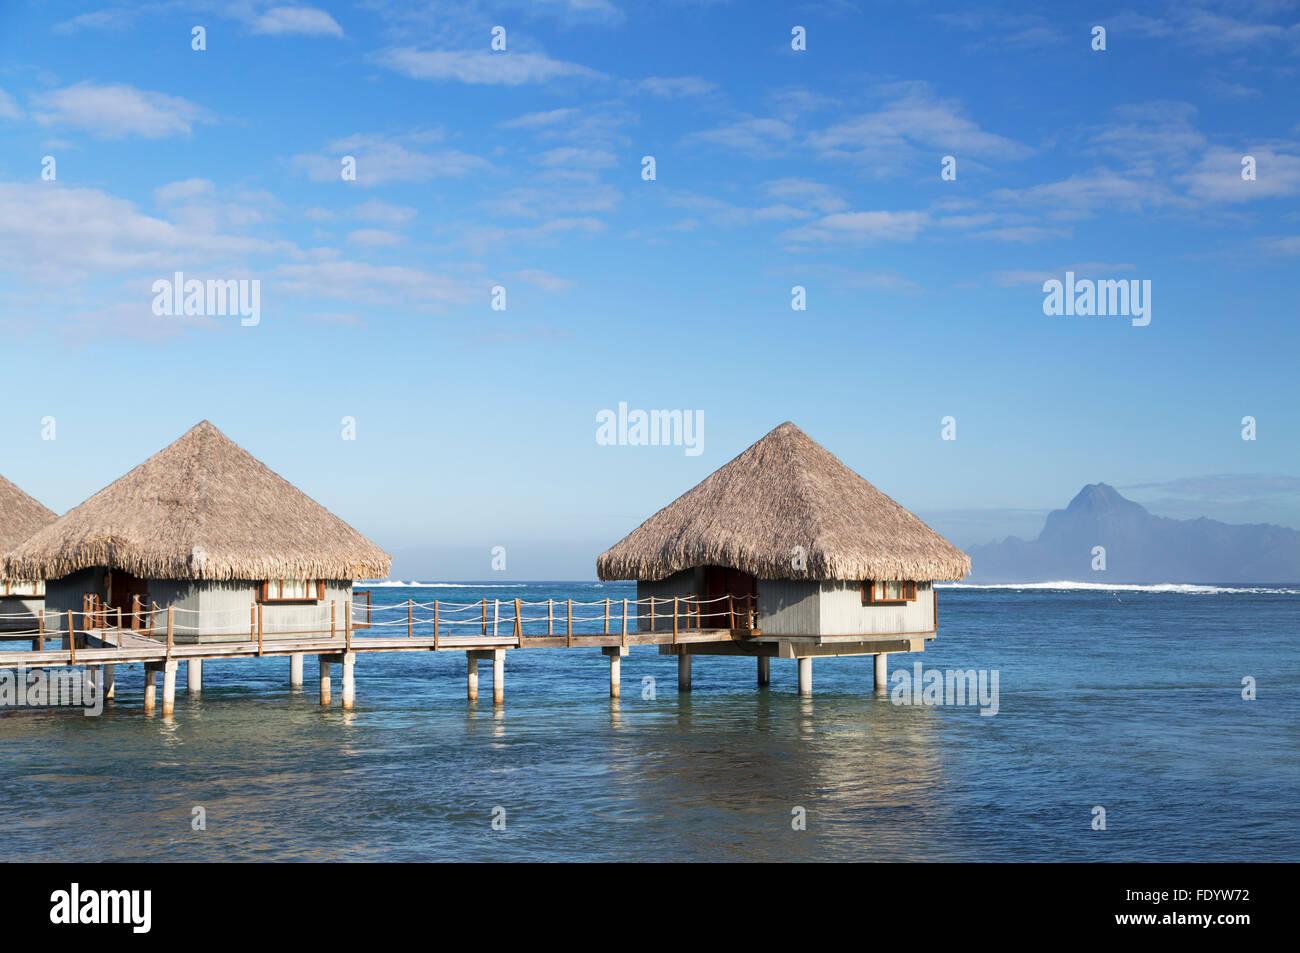 Bungalow Overwater al Le Meridien Tahiti Hotel, Pape'ete, Tahiti, Polinesia Francese Immagini Stock